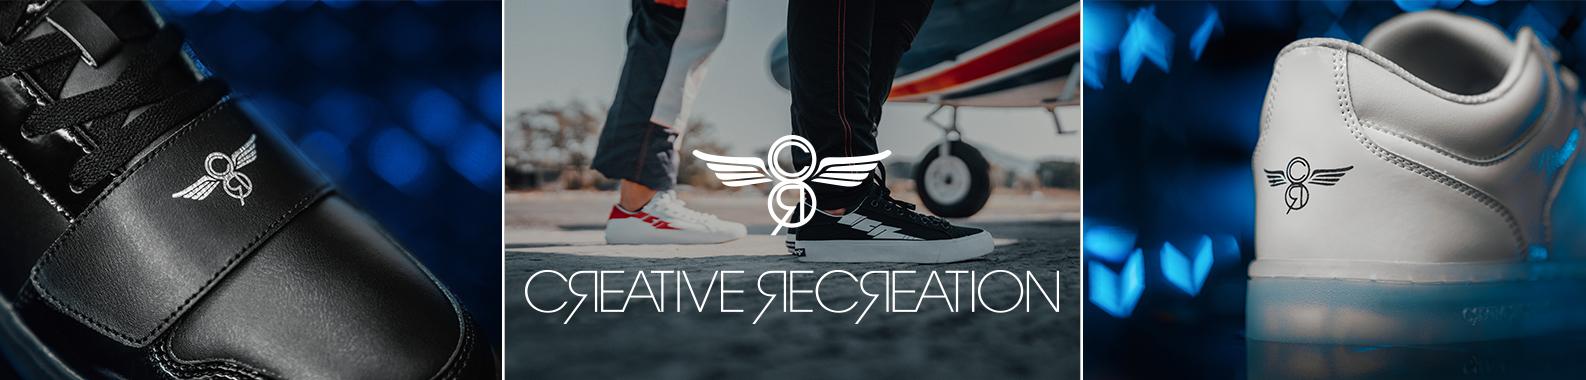 Creative Recreation brand header image